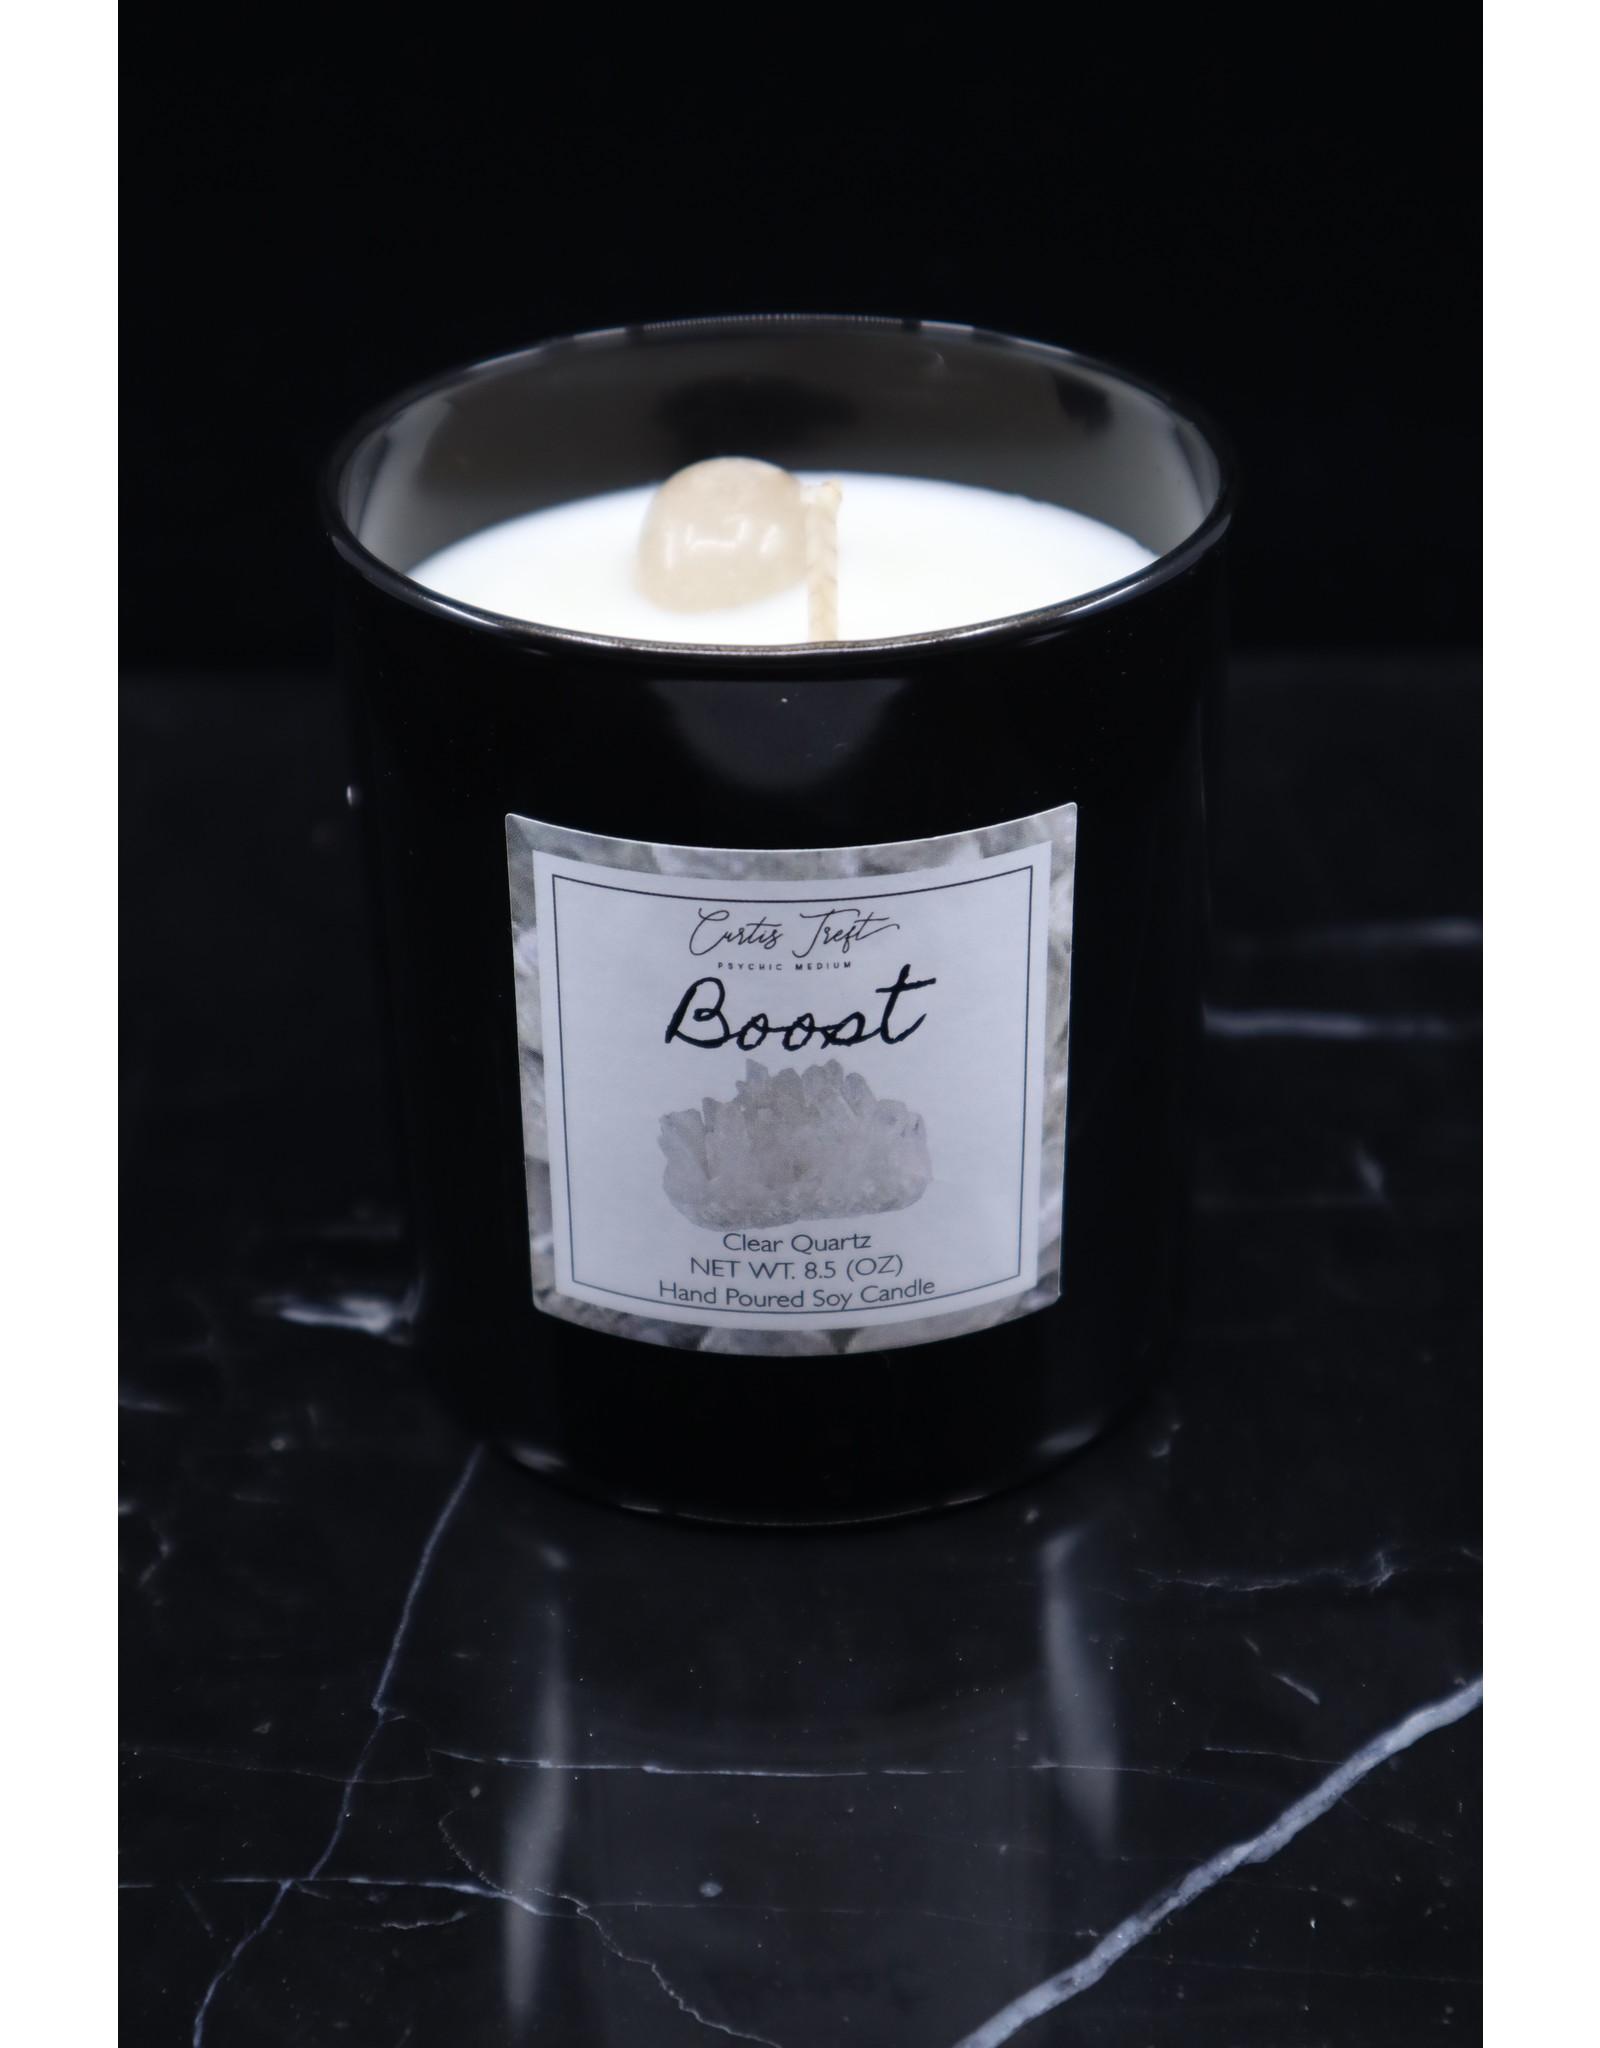 Boost Candle - Clear Quartz